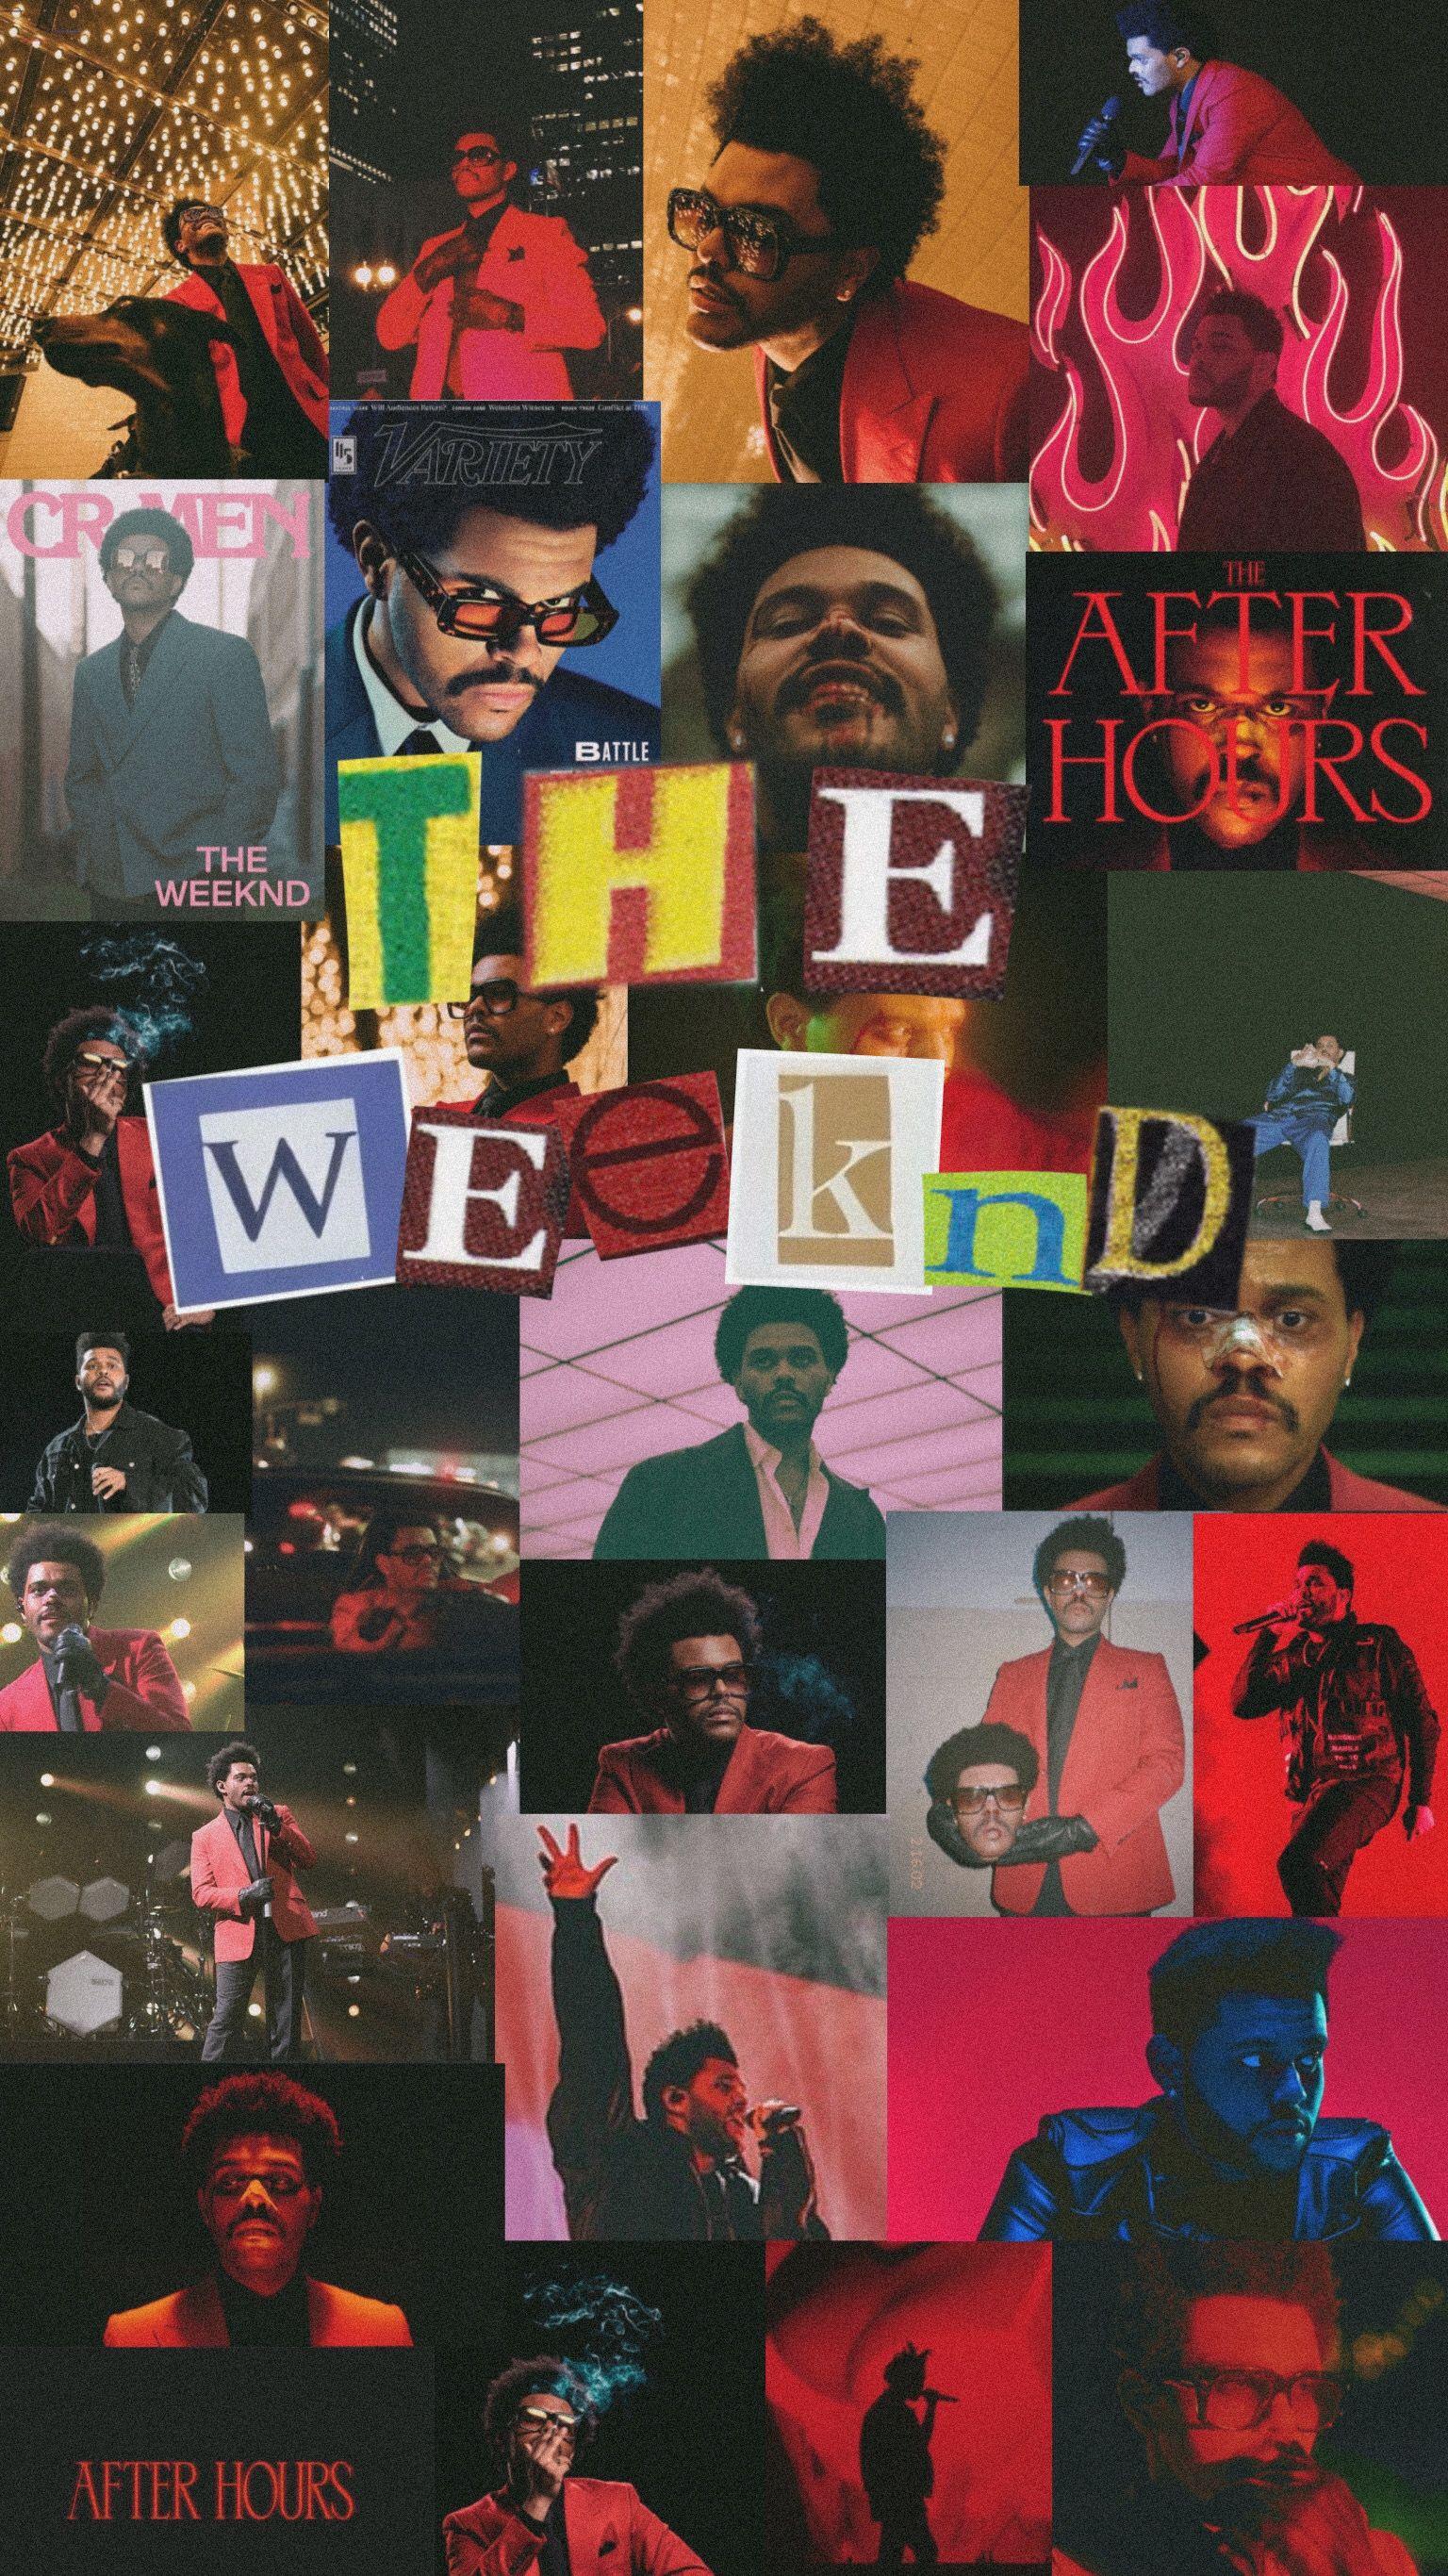 The Weeknd Wallpaper The Weeknd Wallpaper Iphone The Weeknd Poster The Weeknd Background